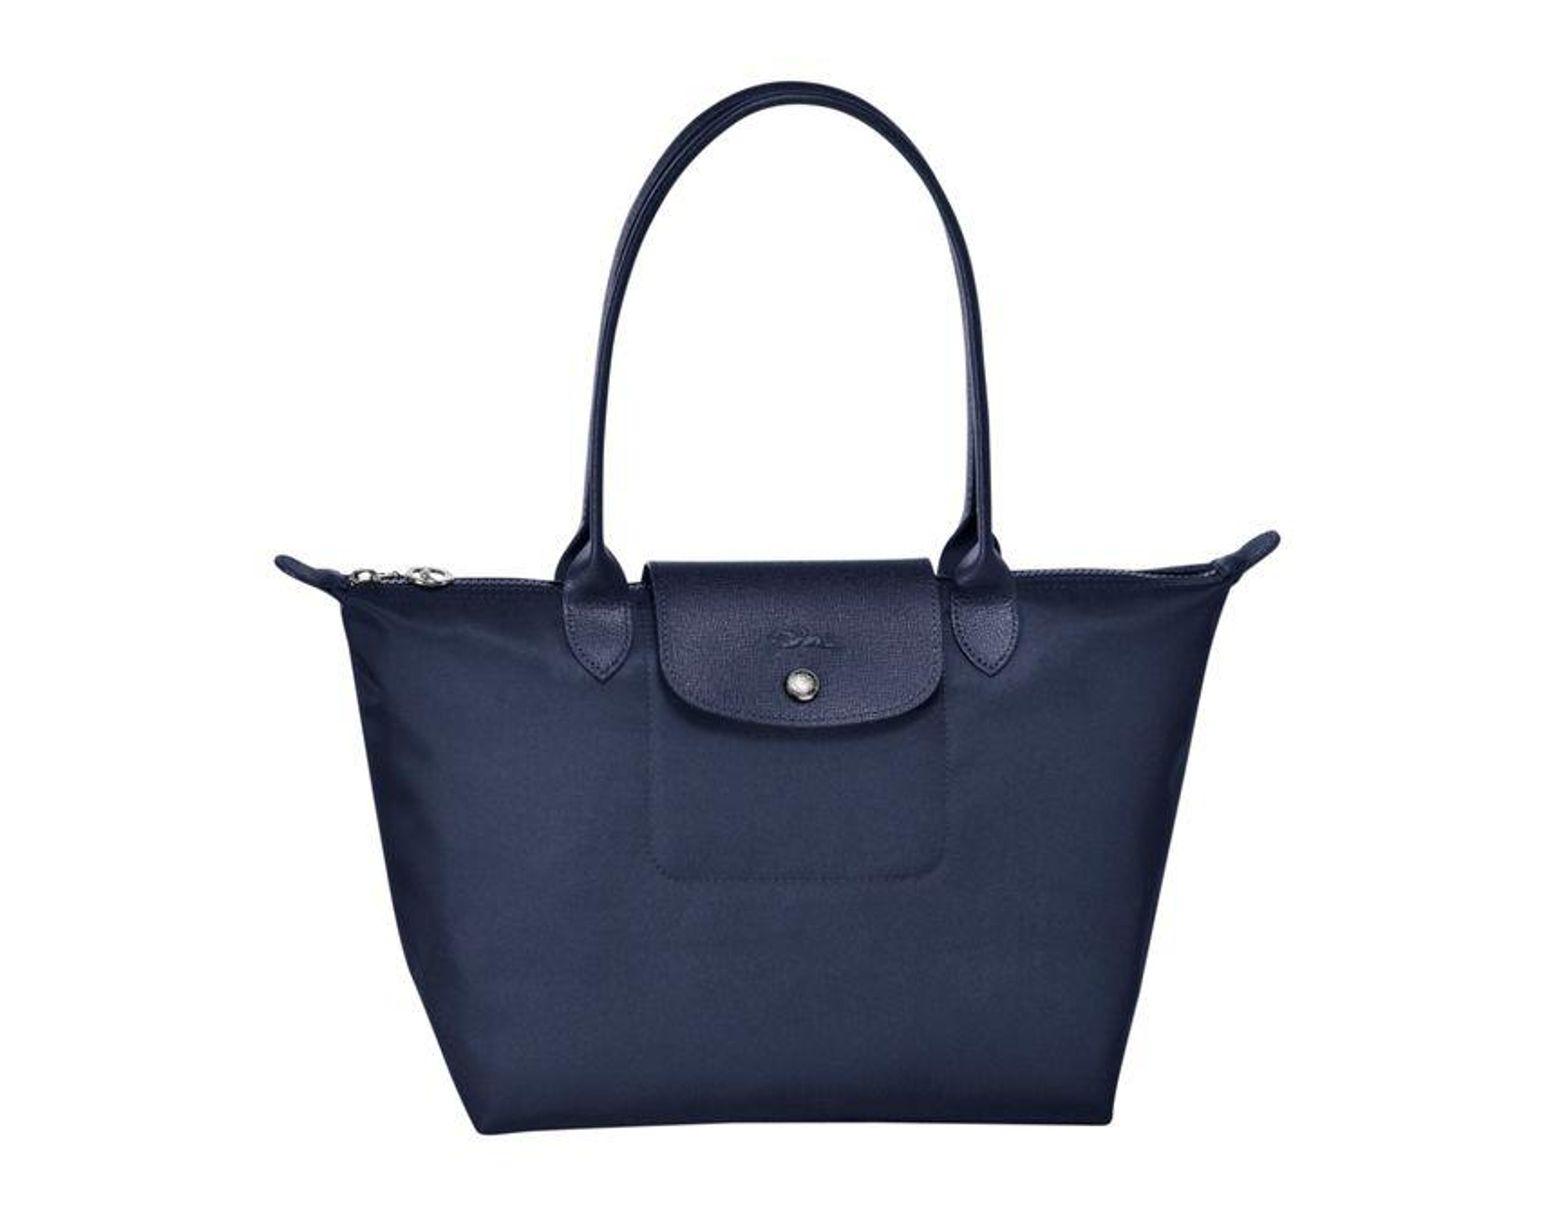 Sac shopping S Le Pliage Néo femme de coloris bleu